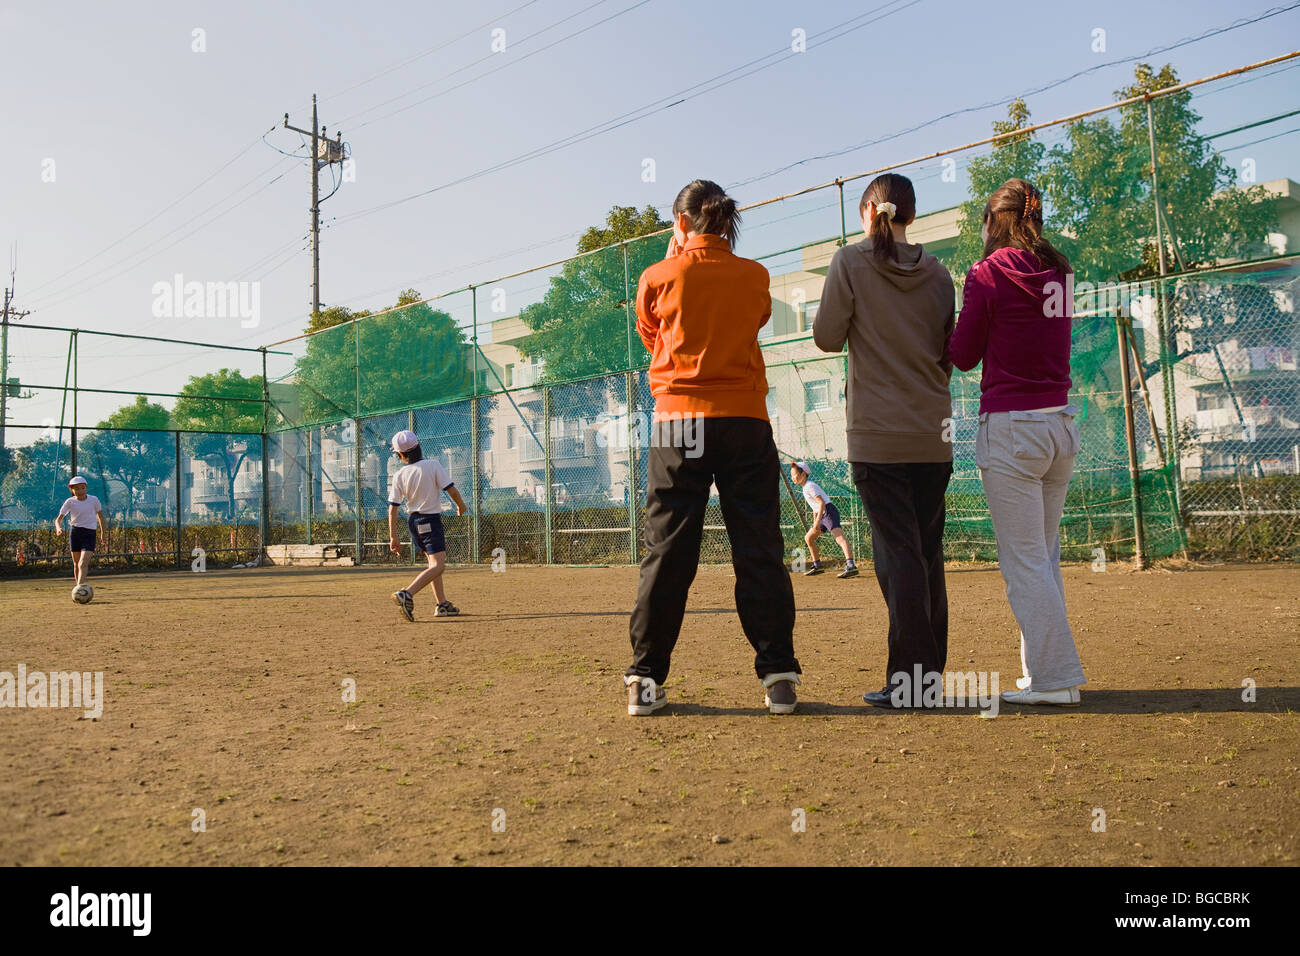 Three mothers cheering children - Stock Image